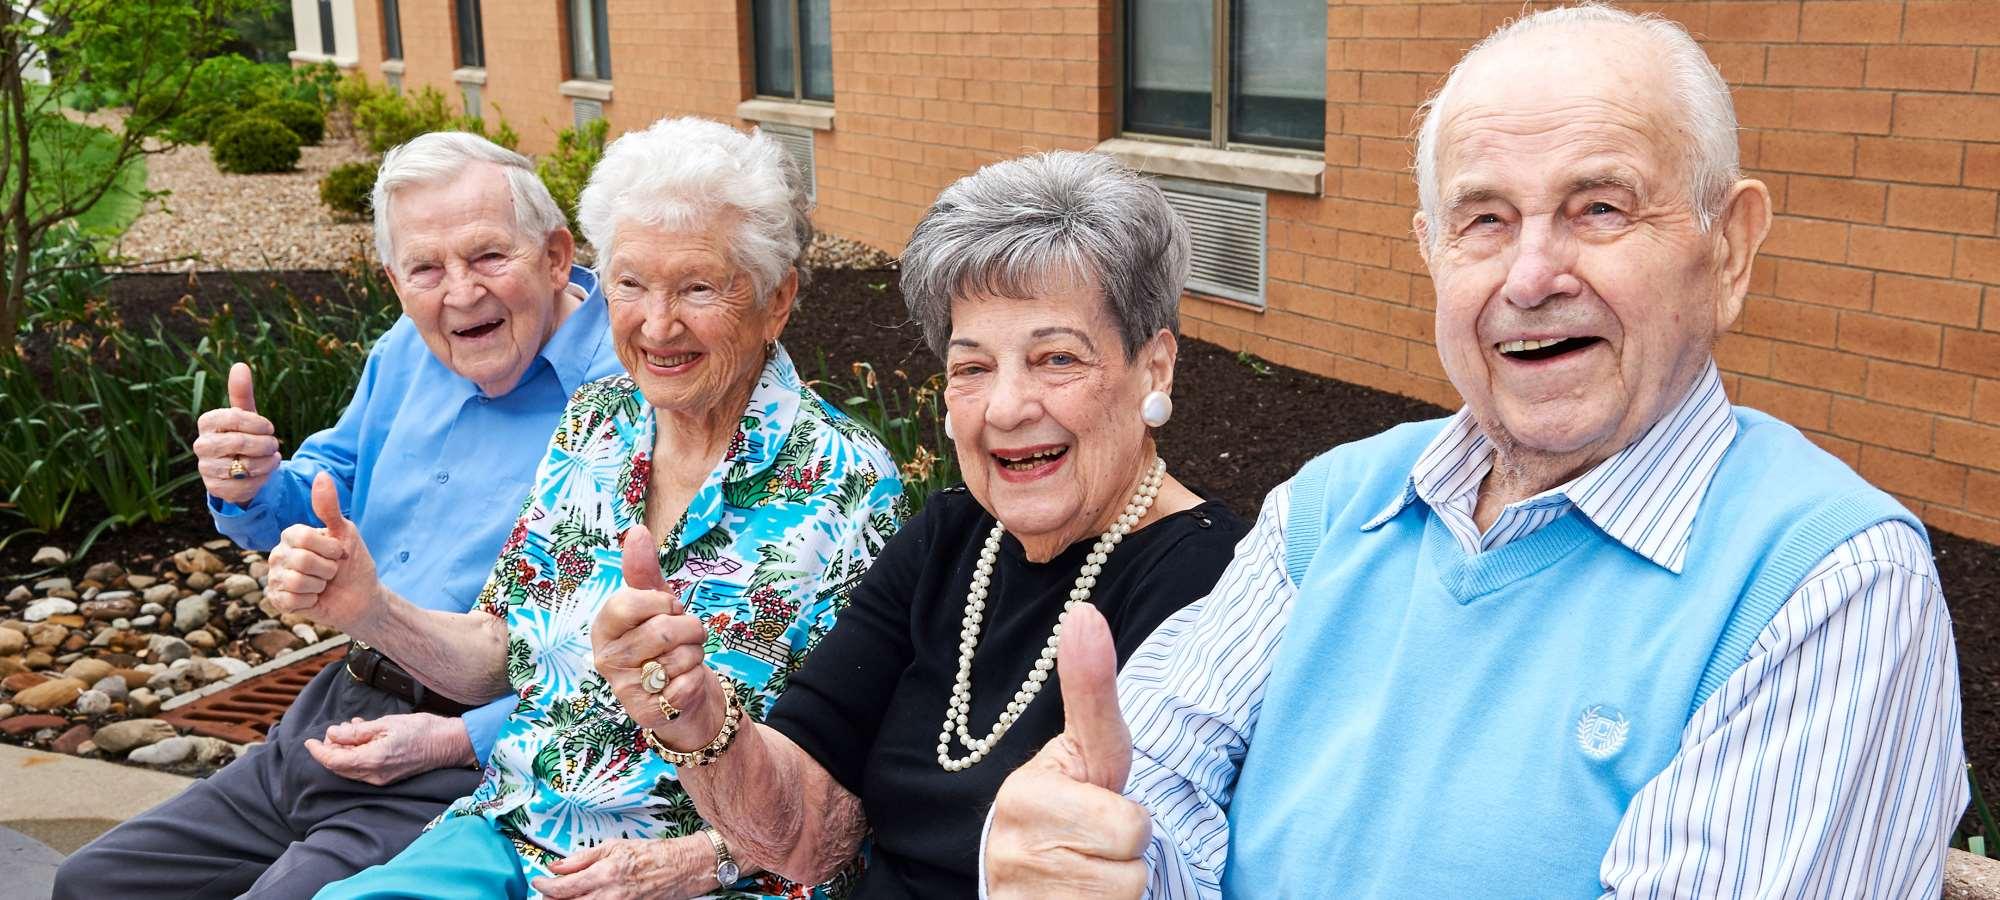 Ohio's Top Rated Local® Senior Living Communities Award Winner: Canton Christian Home